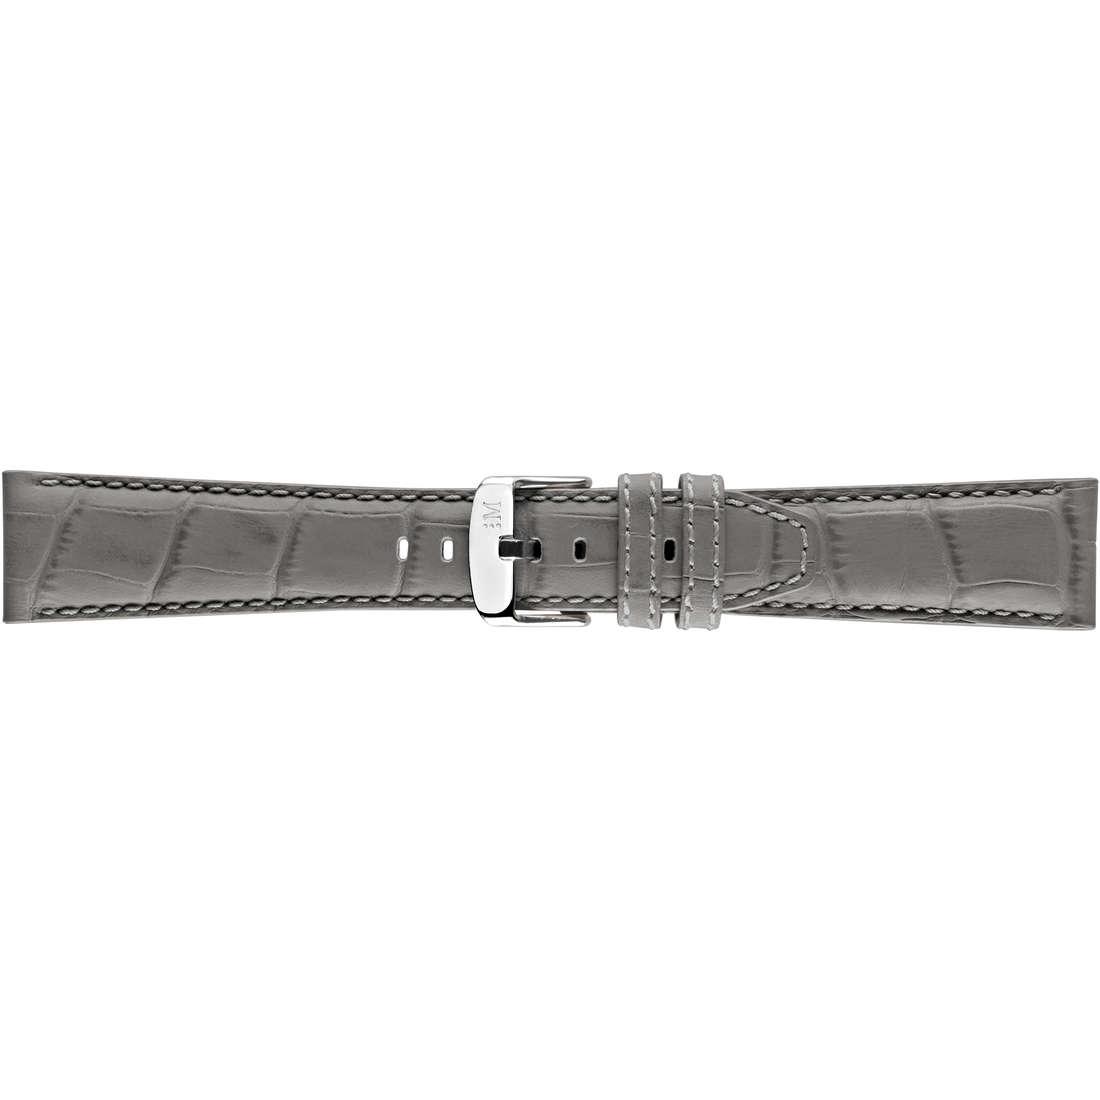 watch watch bands watch straps man Morellato Linea Sport A01X4497B44092CR18